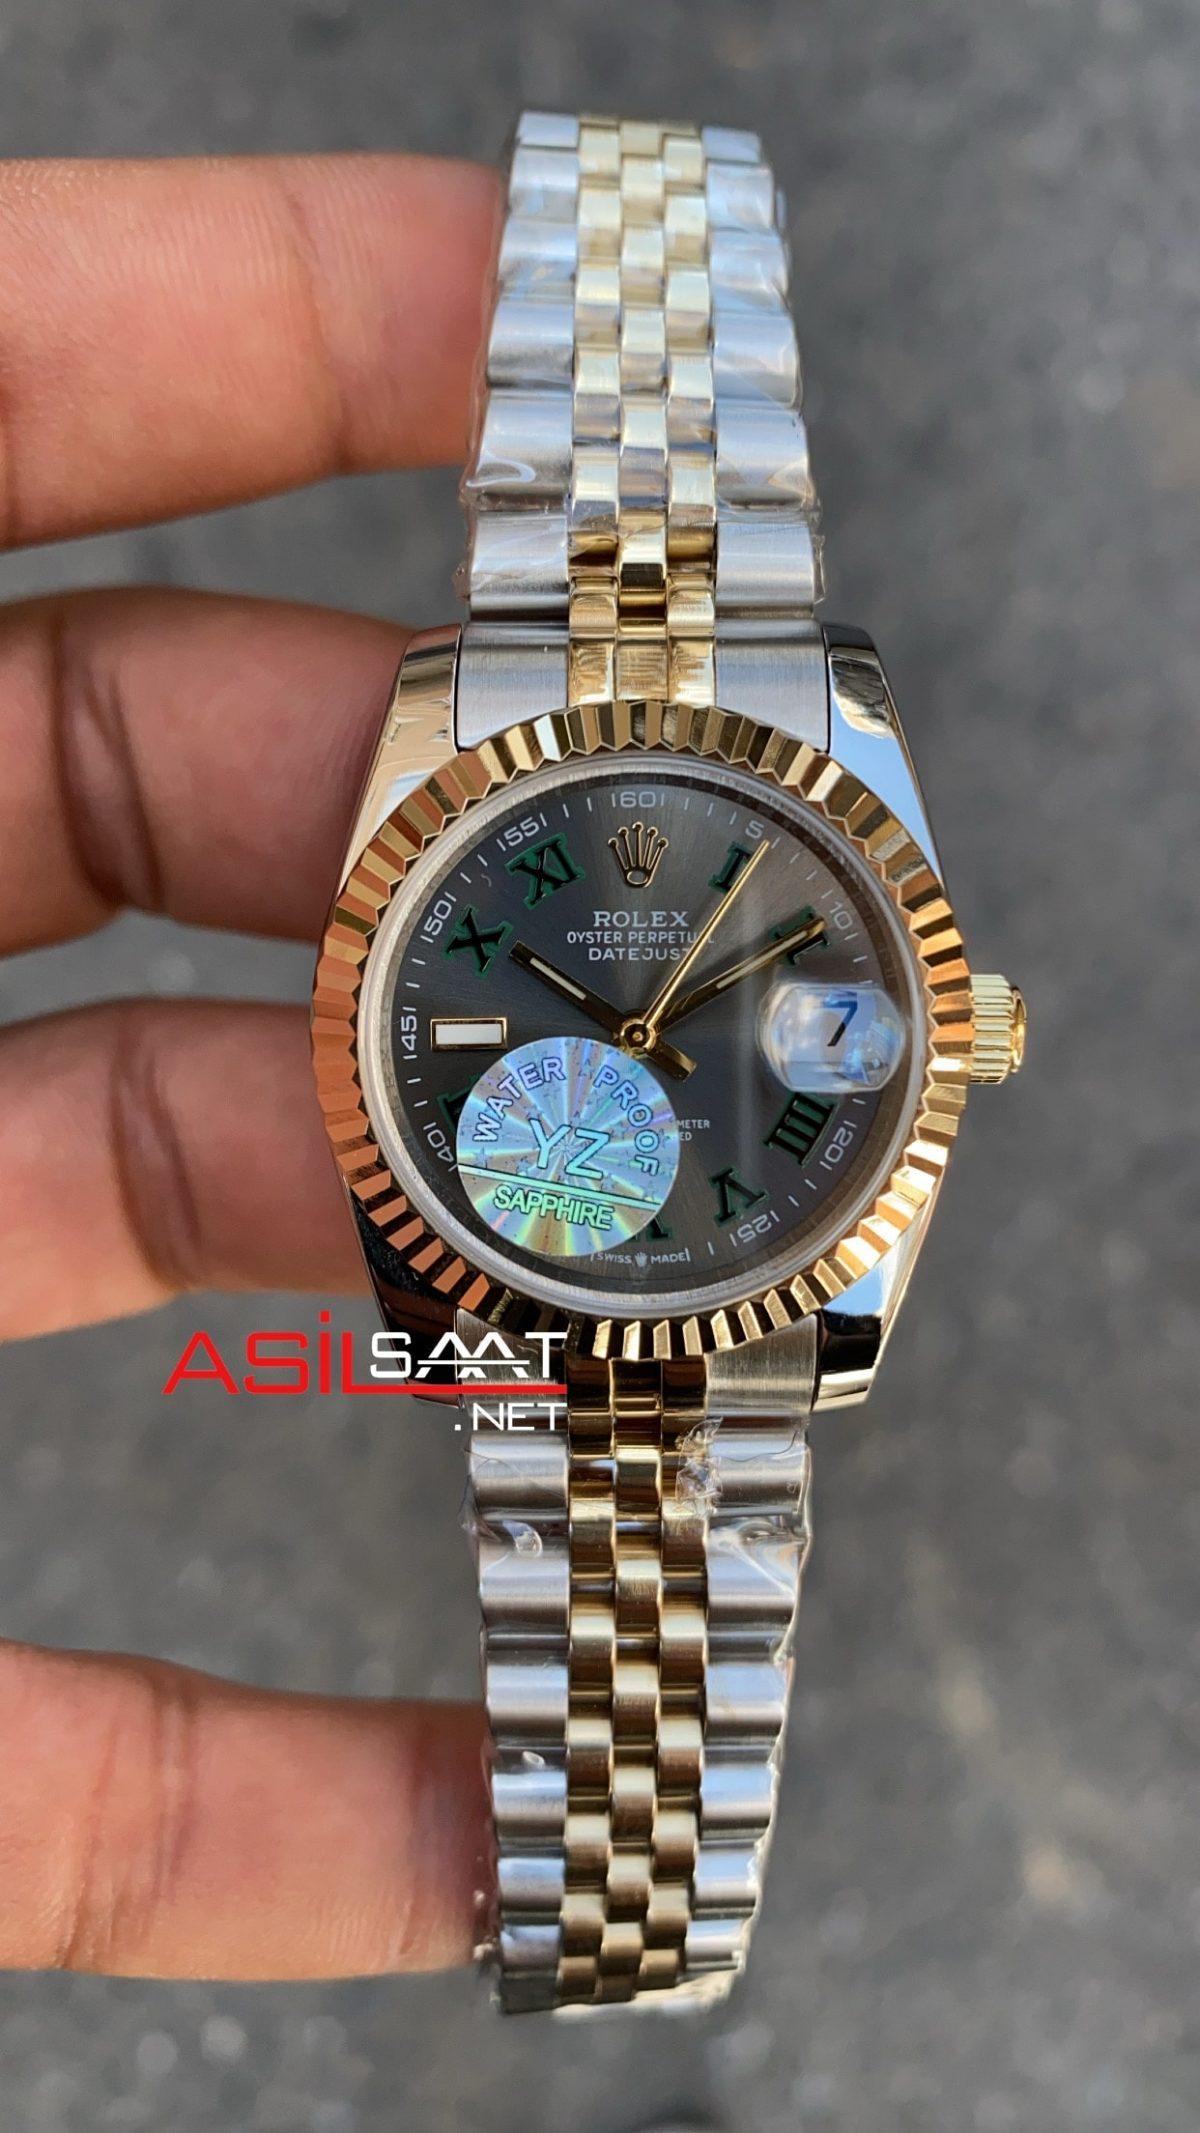 Rolex Datejust Wimbledon Bayan 31 mm 126333 RBA057